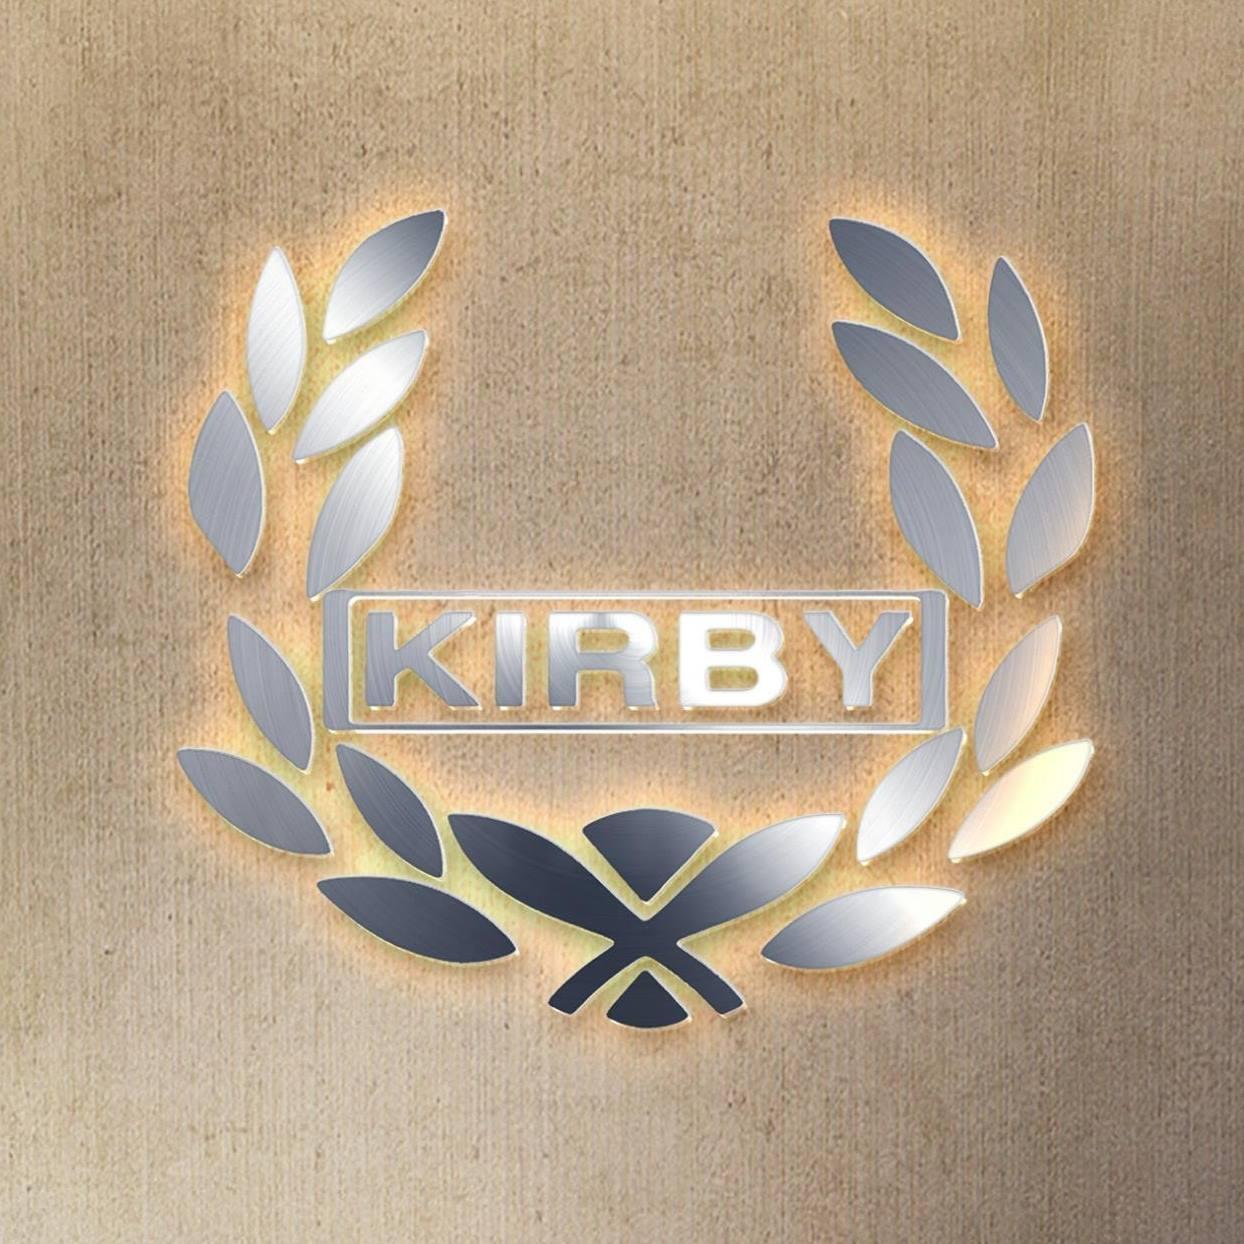 Kirby Company - كيربي